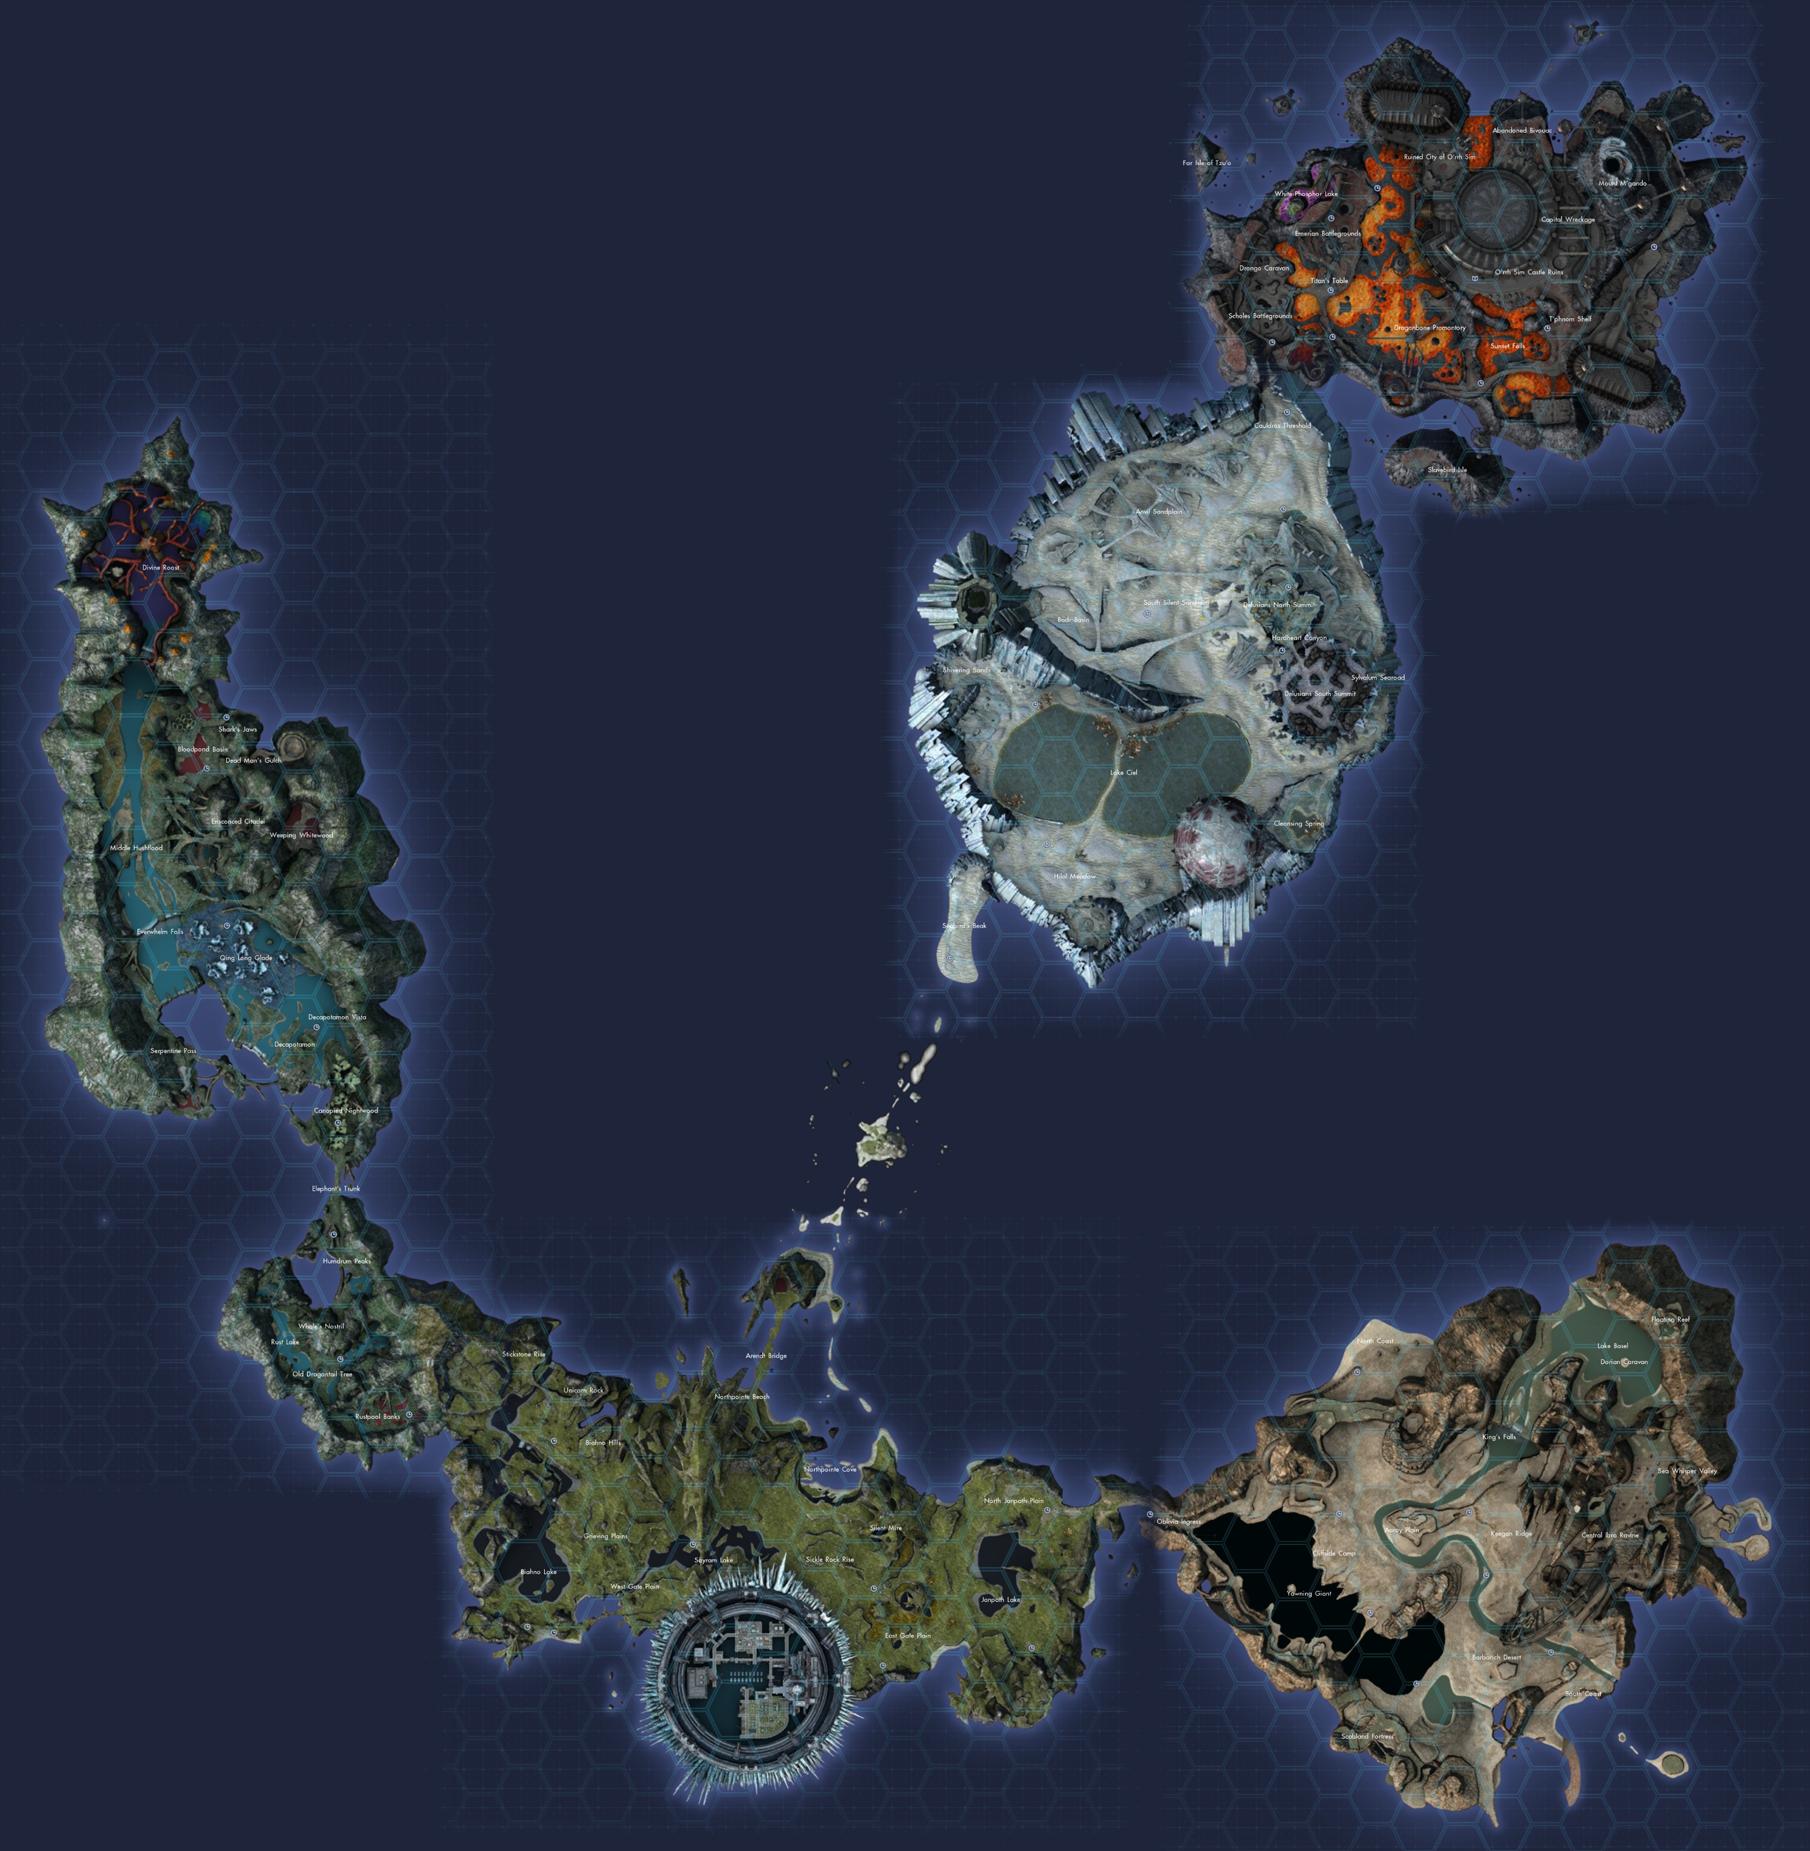 Xenoblade Chronicles Map Mira | Xenoblade Wiki | FANDOM powered by Wikia